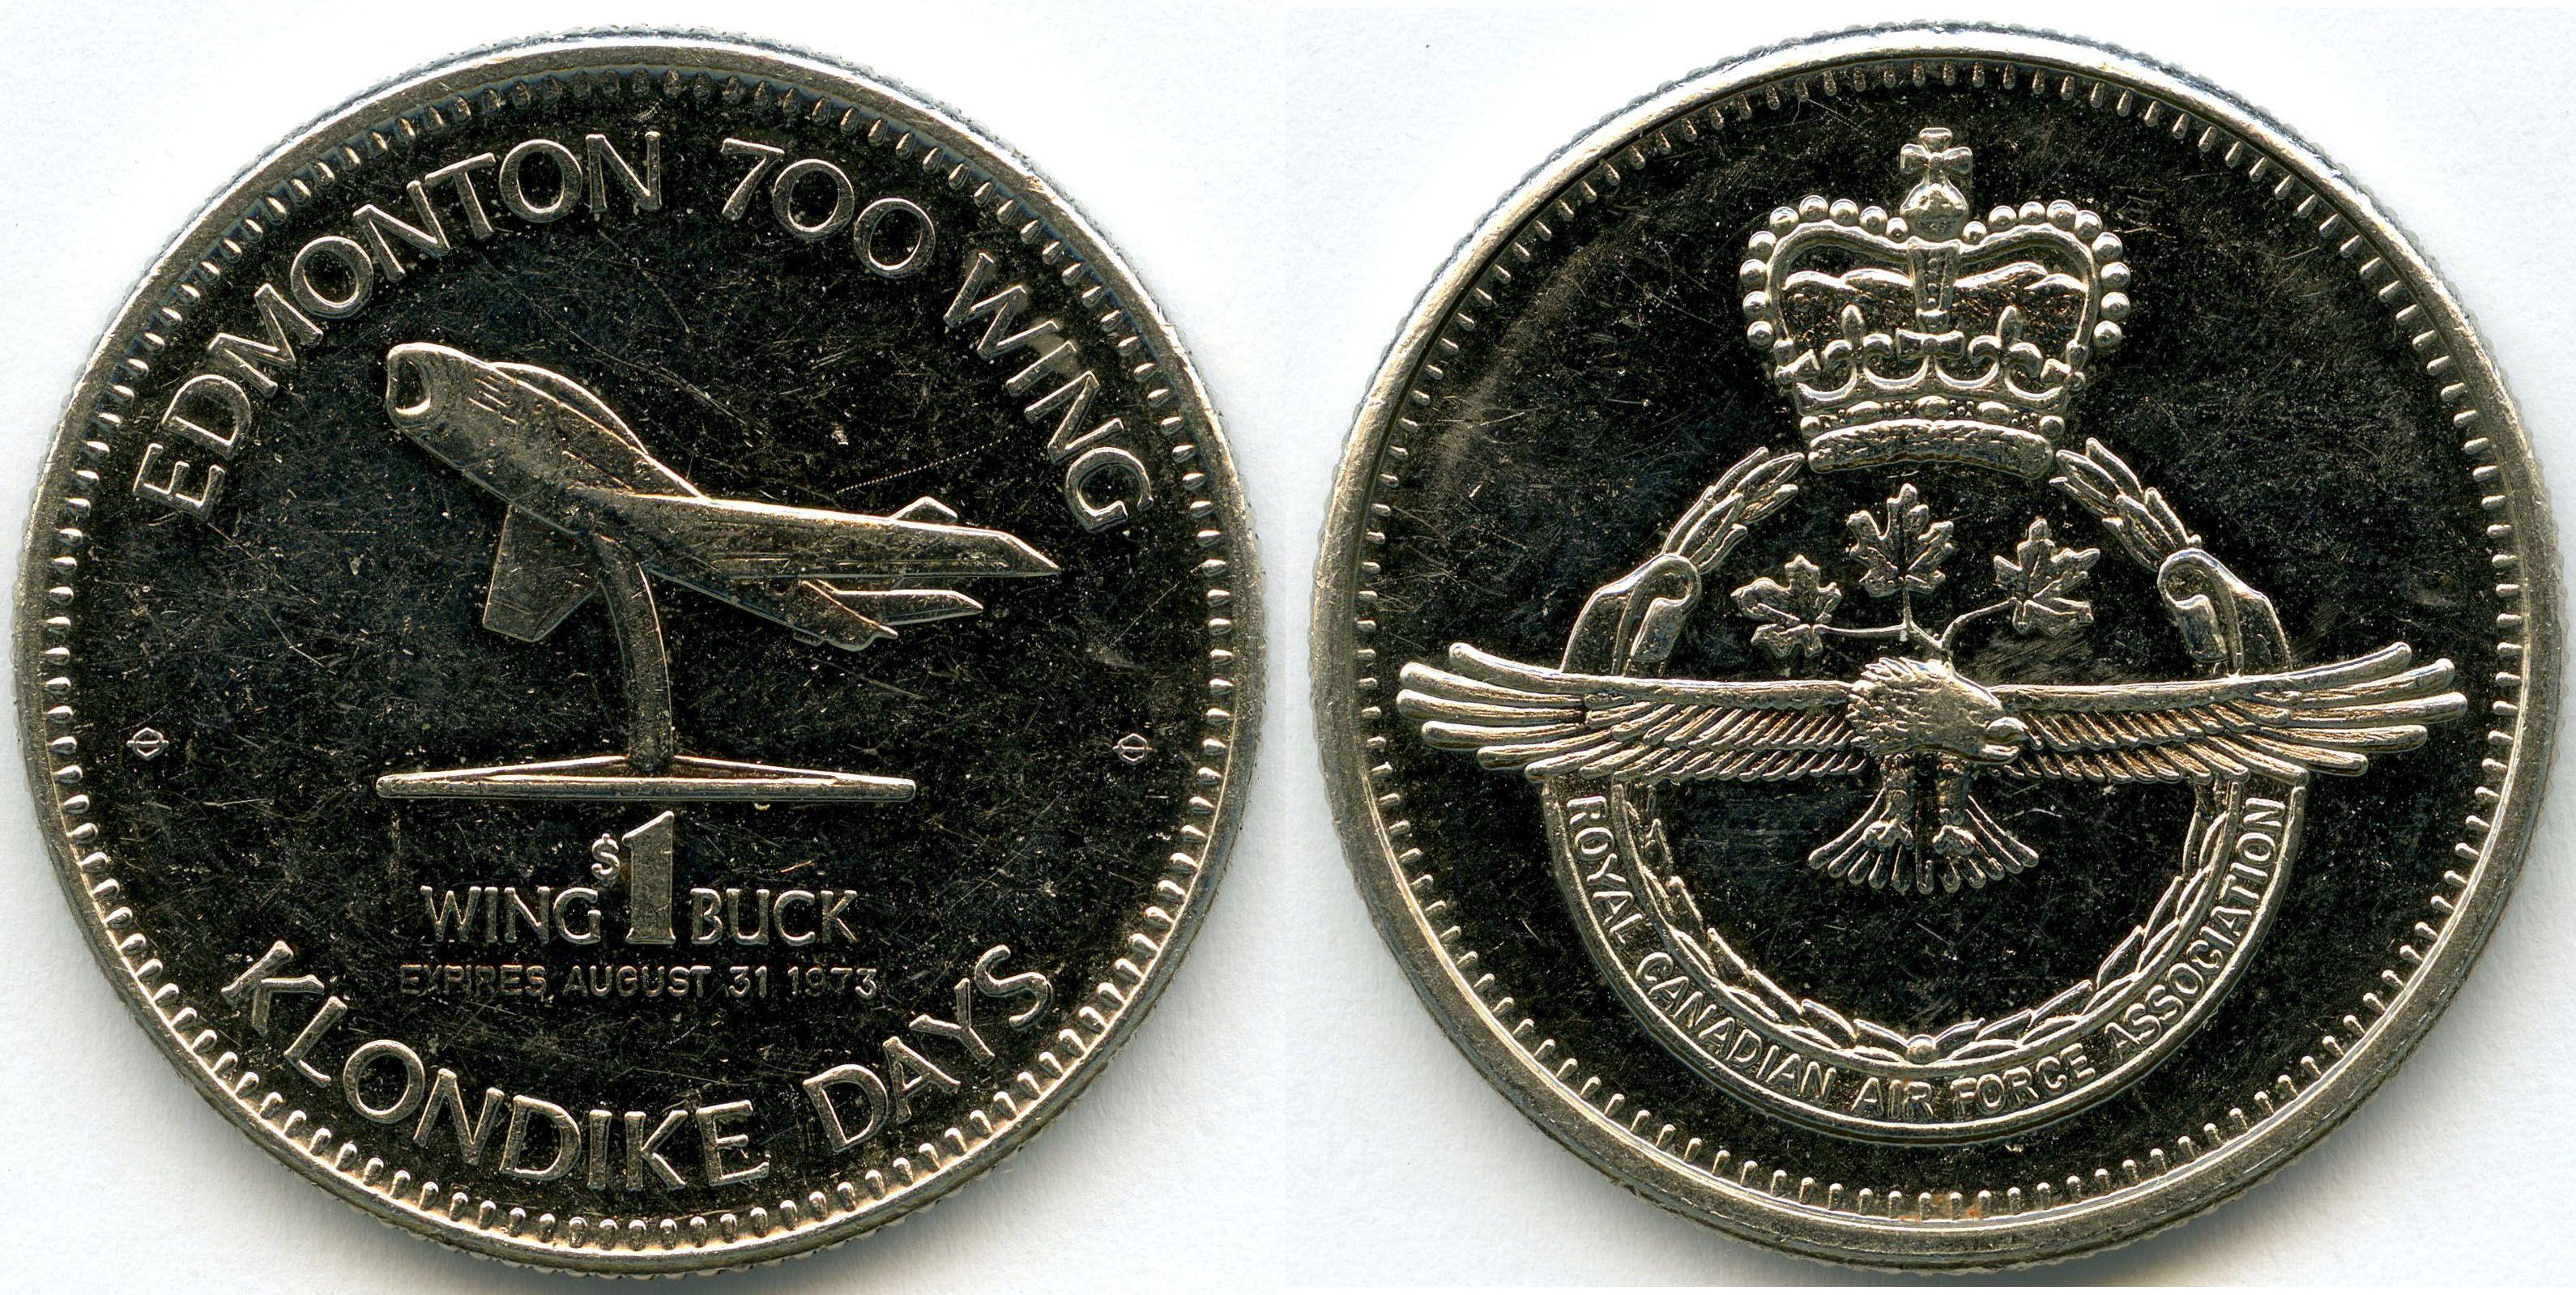 Edmonton 700 Wing Royal Canadian Air Force Association